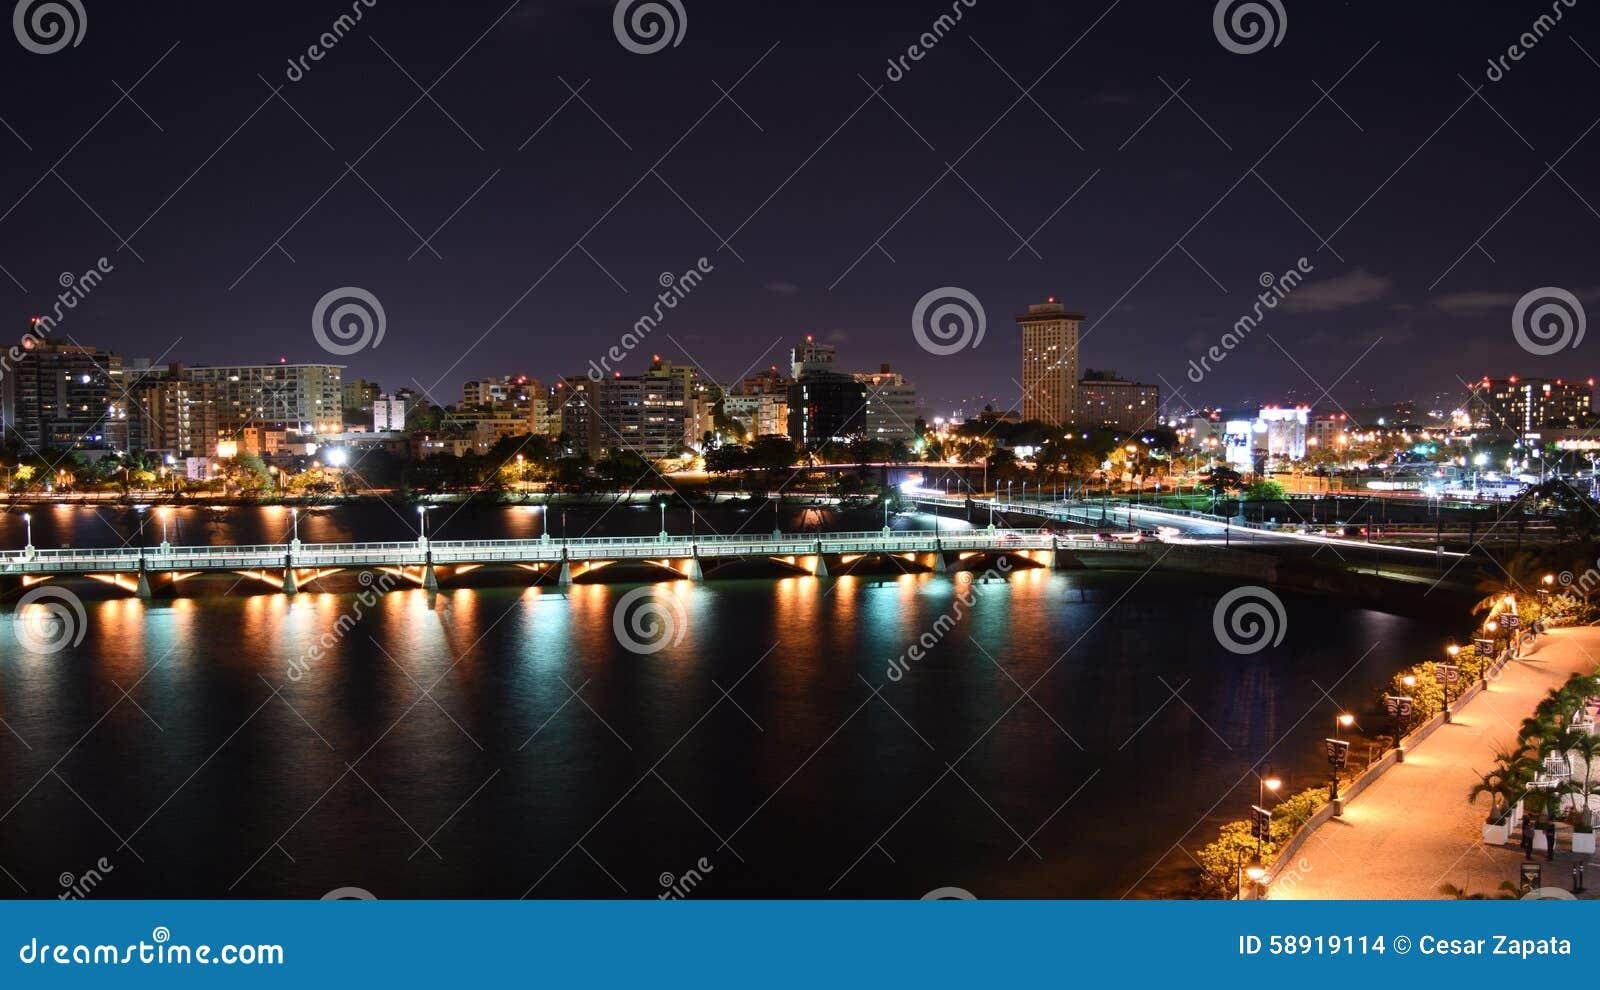 City View of San Juan at night